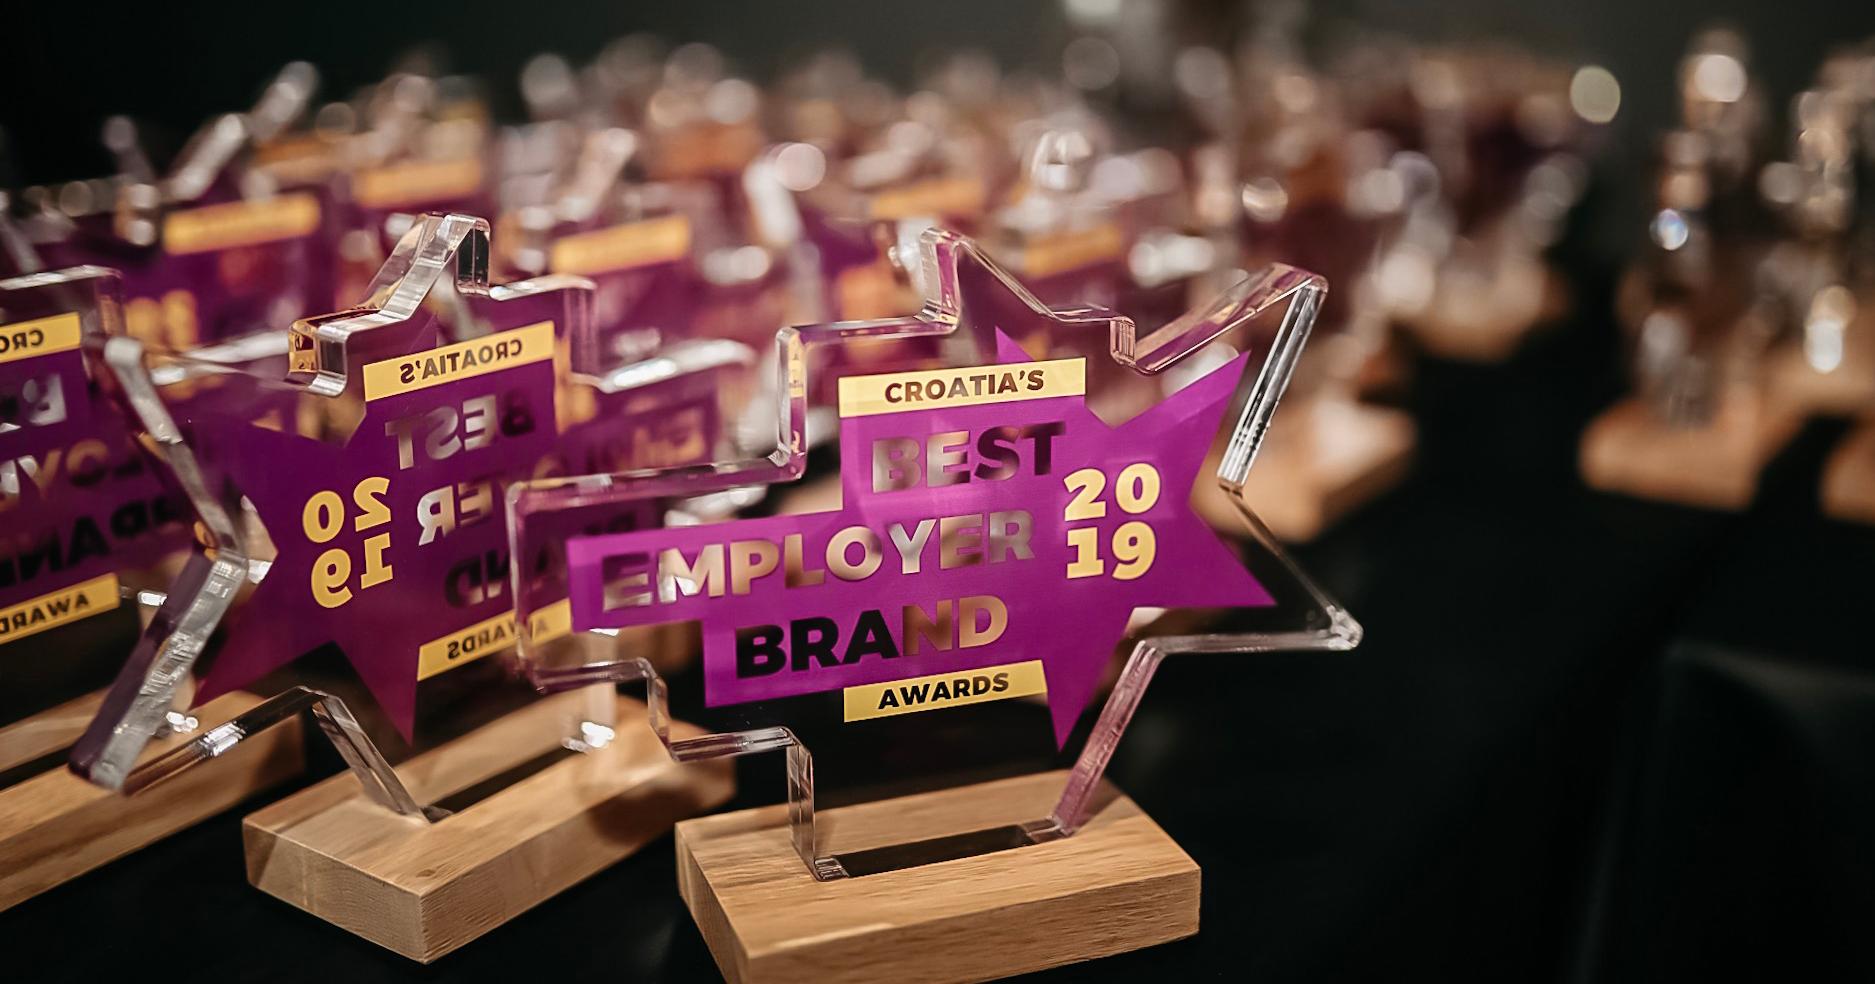 Croatia's Best Employer Brand Awards